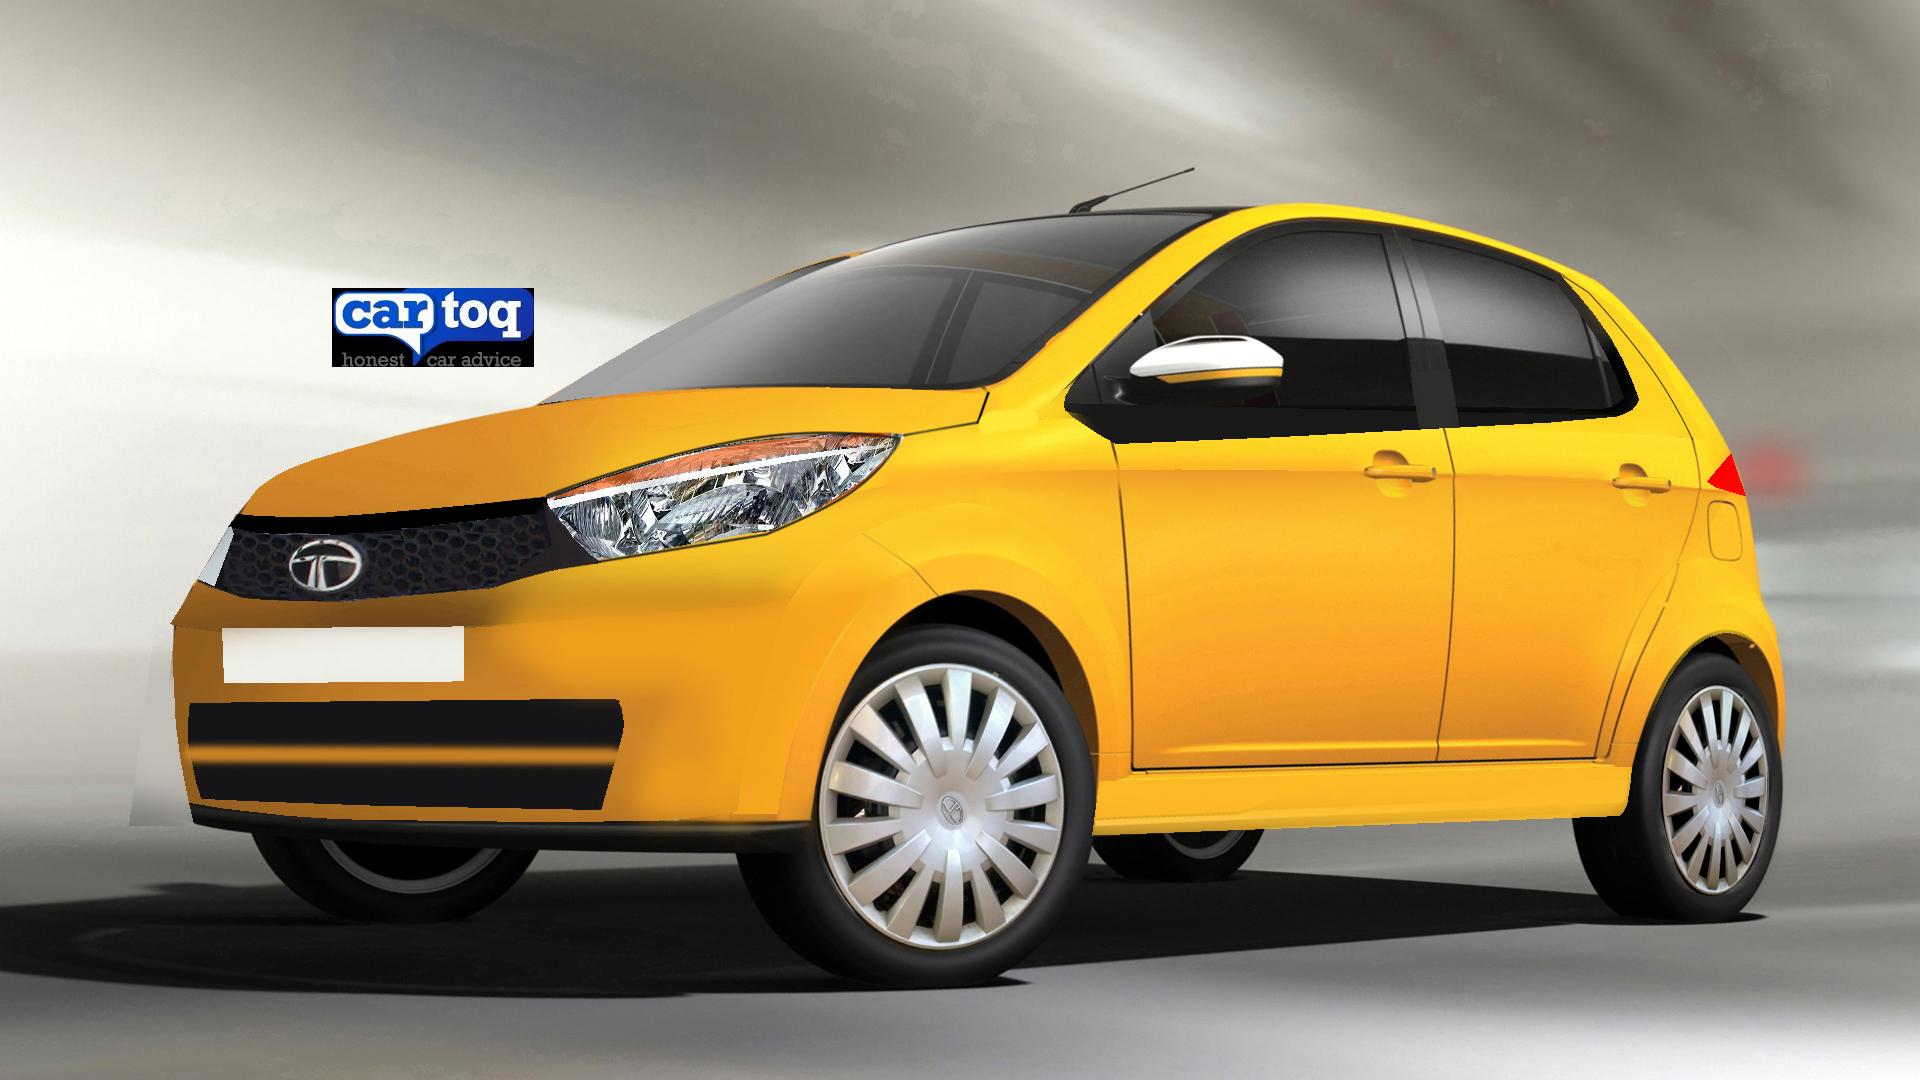 CarToq Exclusive – 2015 Tata Kite compact sedan caught on video